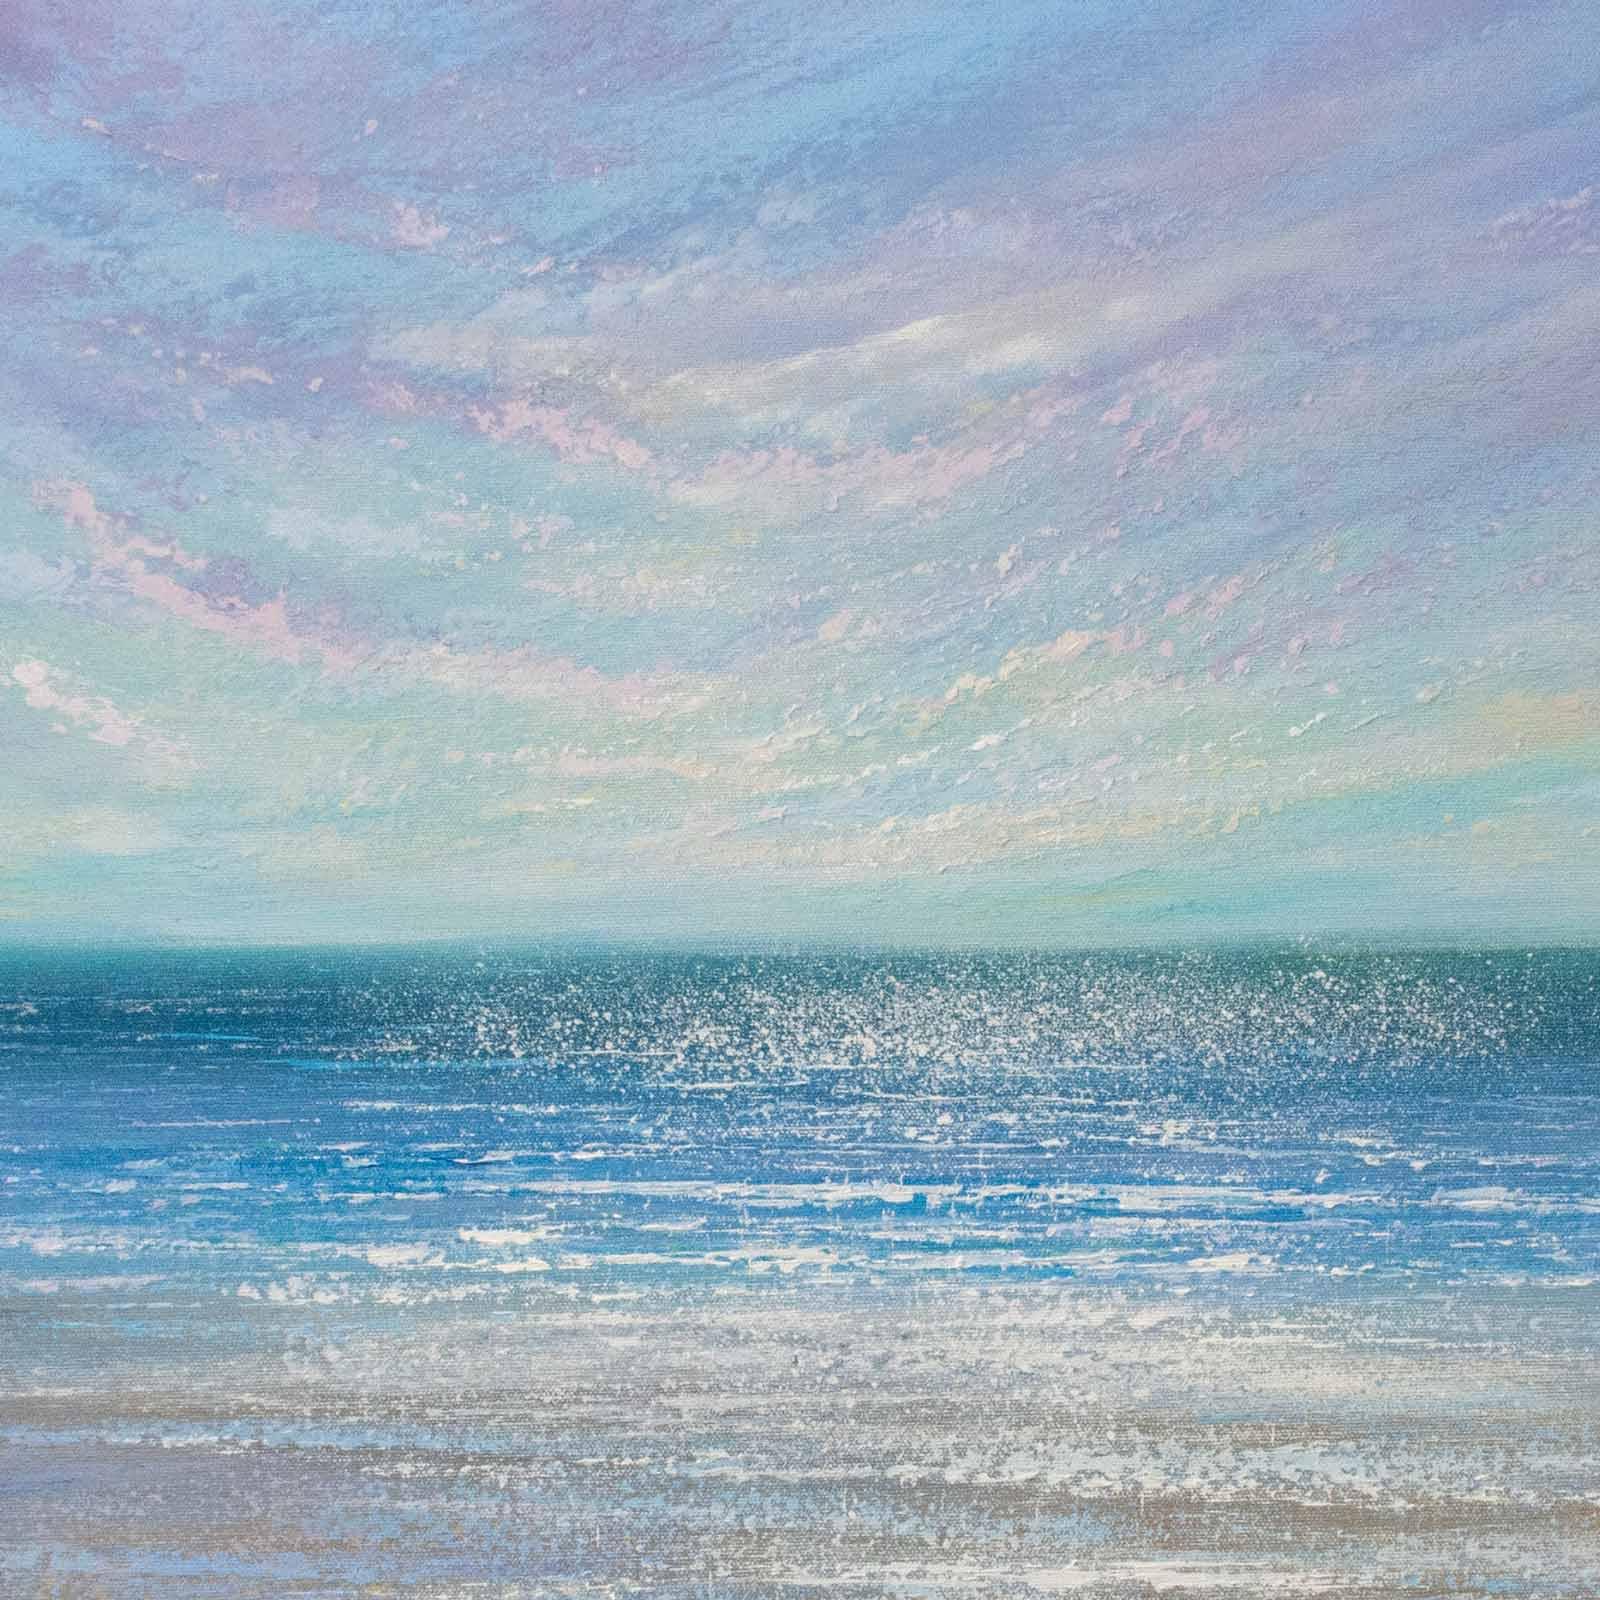 Lilac Skies, Wittering